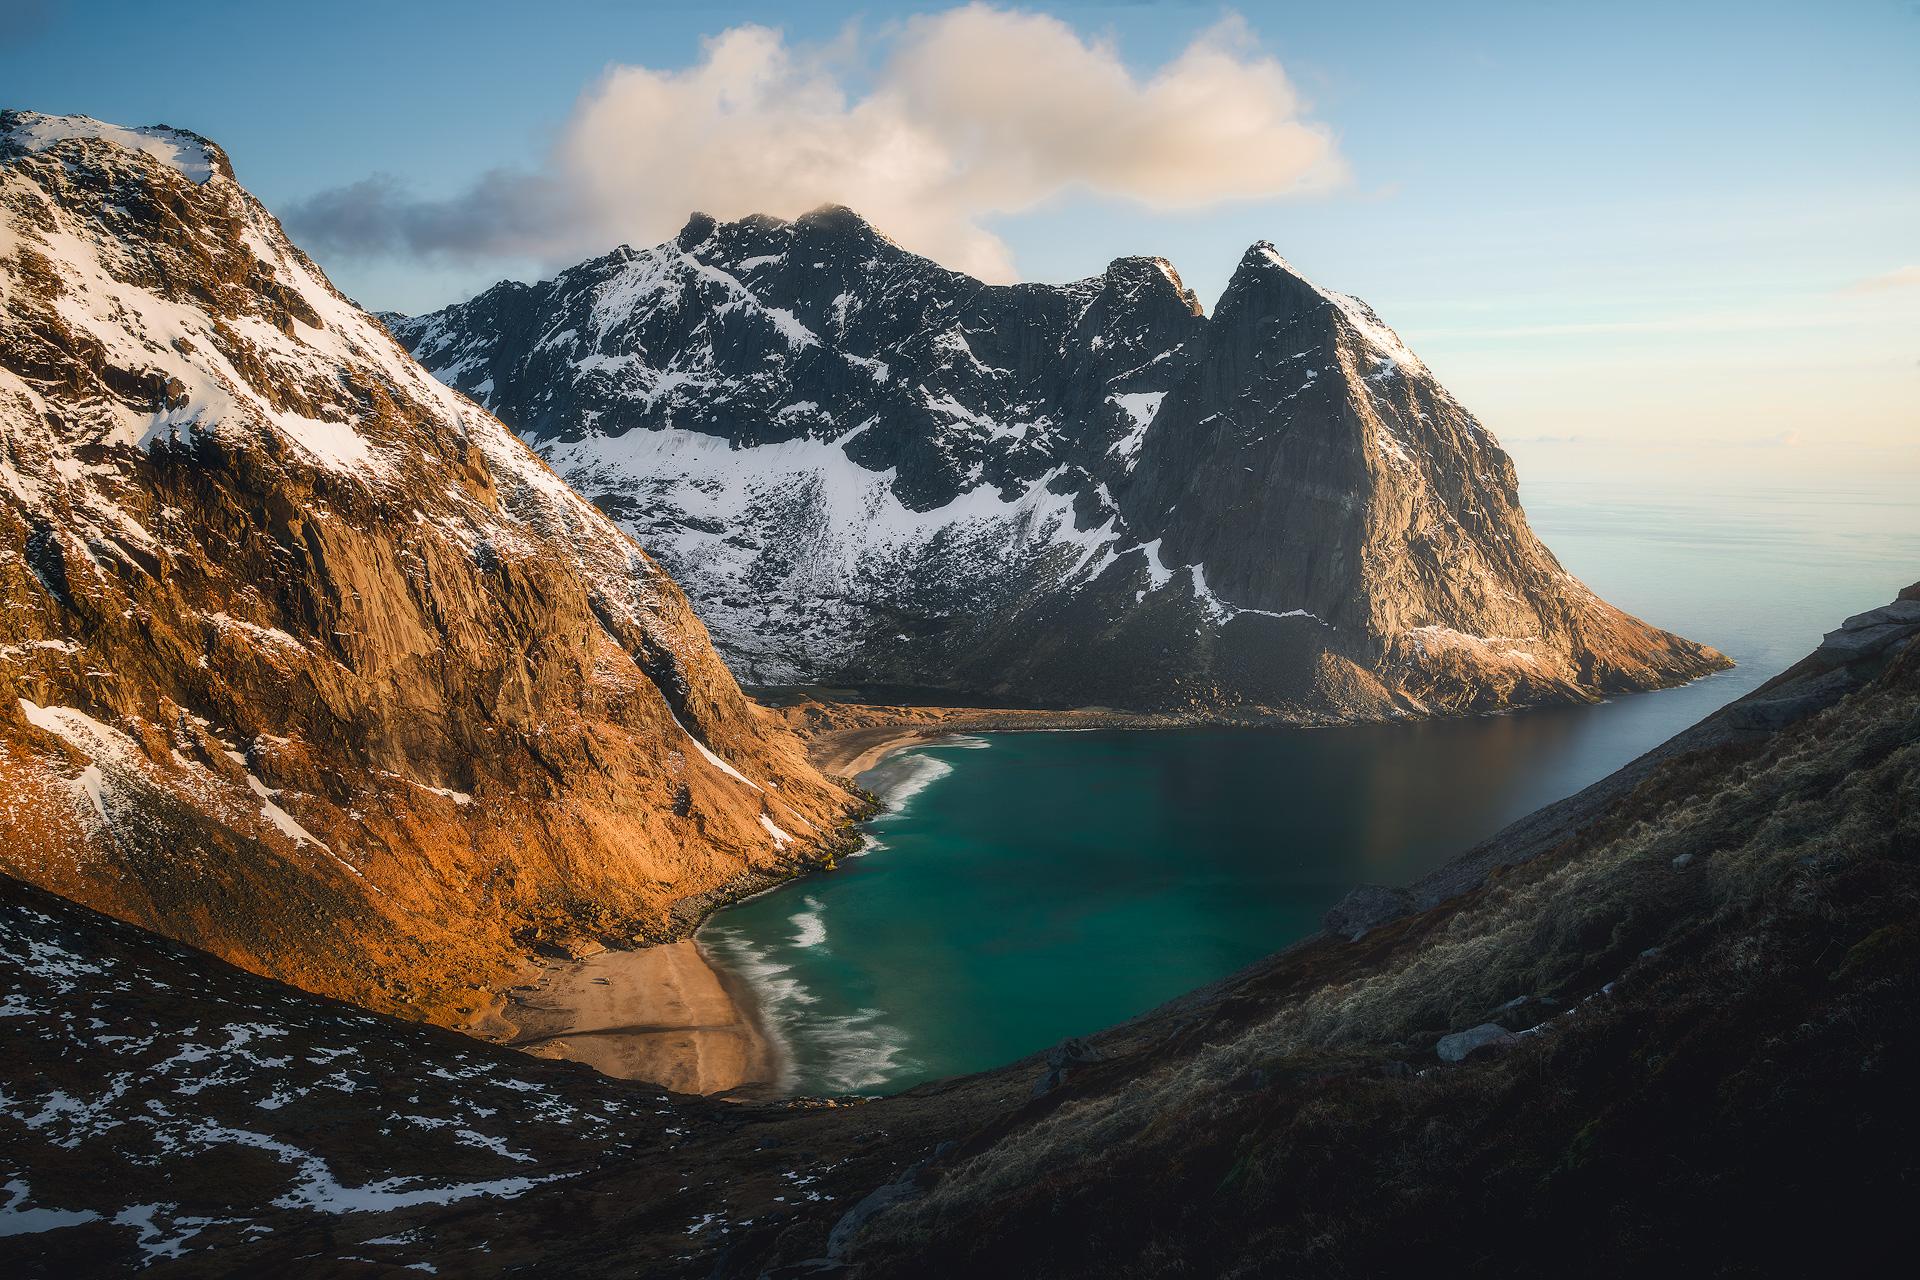 Daytime landscape in Lofoten, Norway